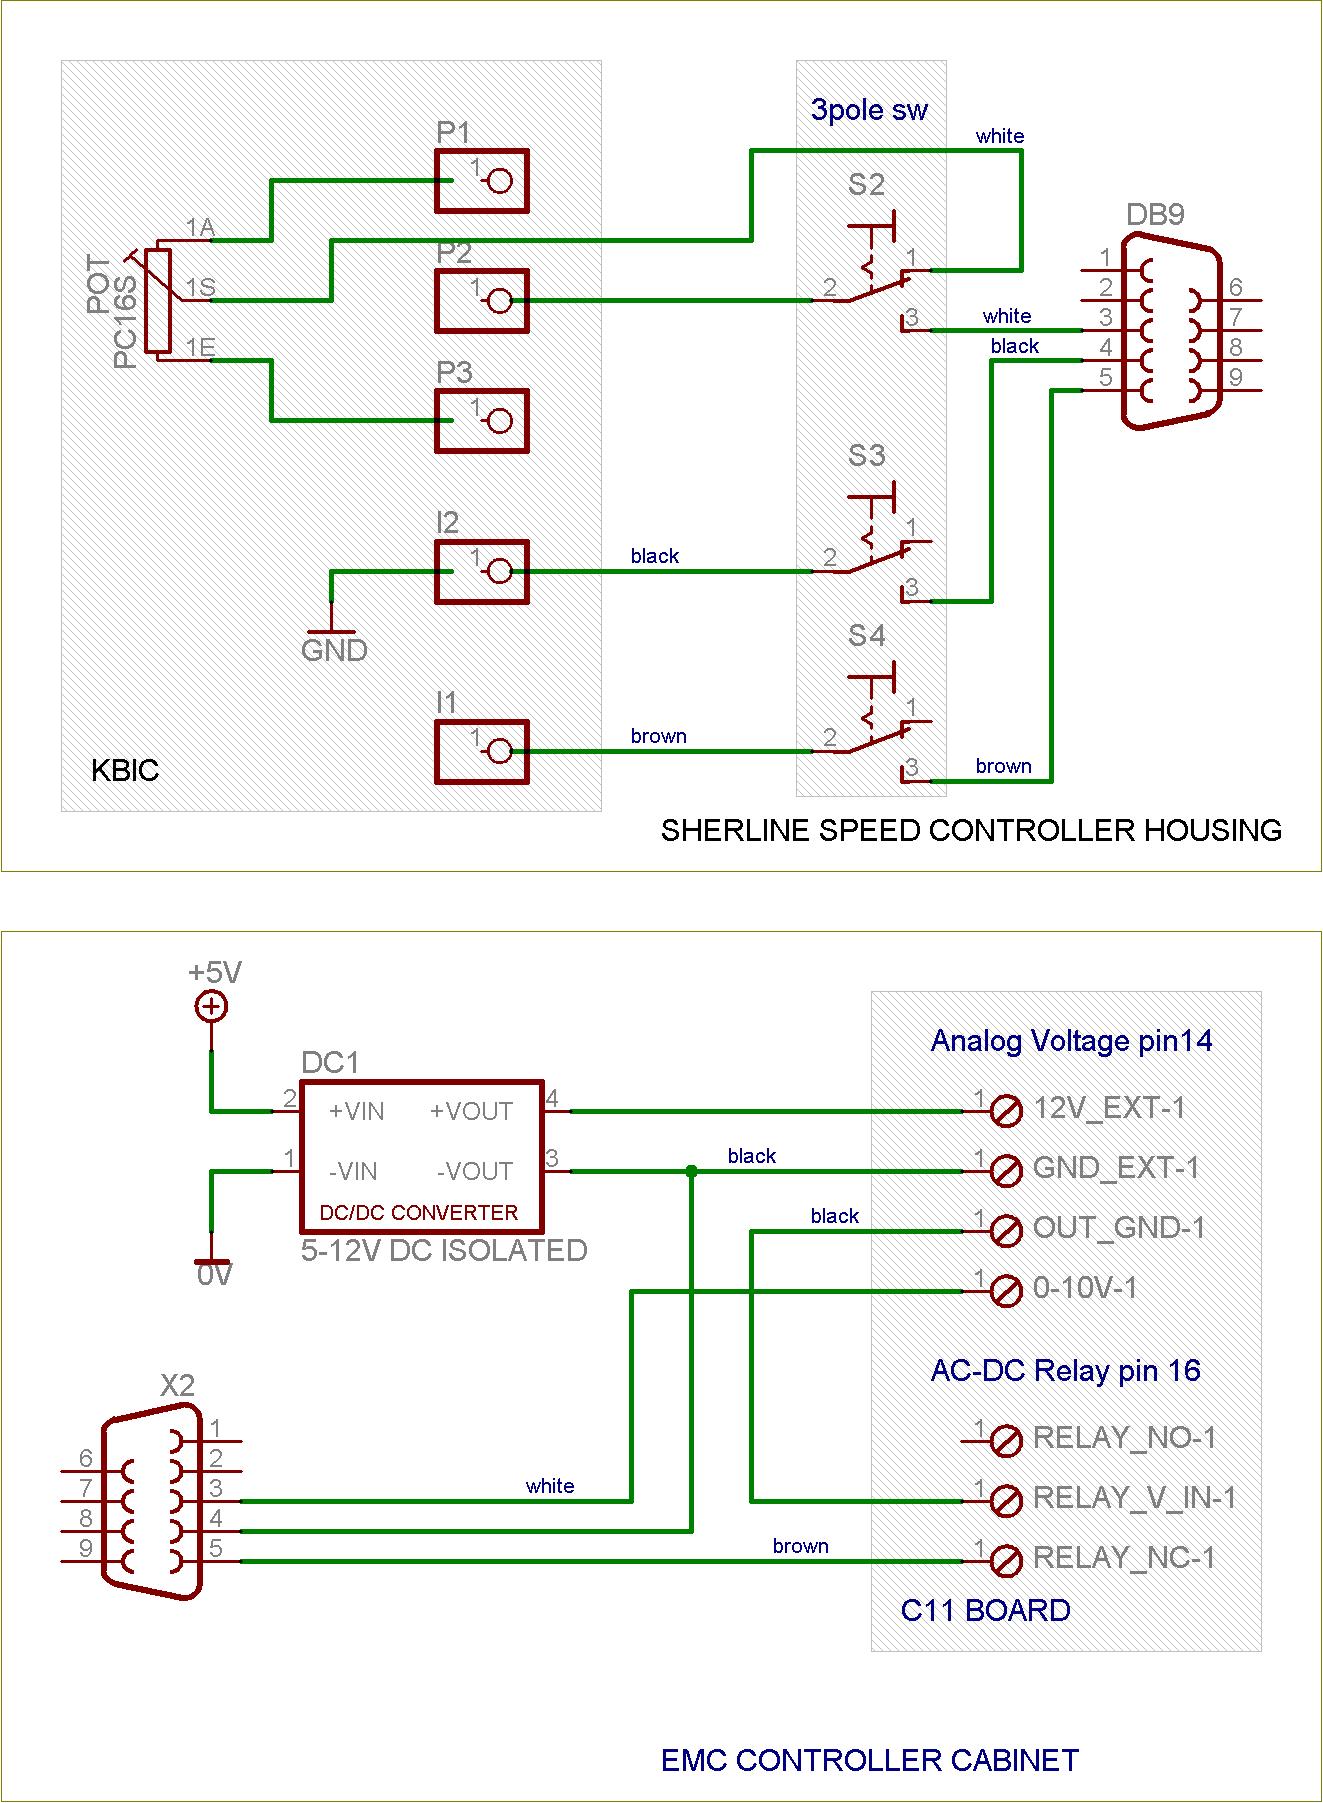 Kbic 120 Wiring Diagram High Torque Stepper Motor Stepper Motor Driver Stepper